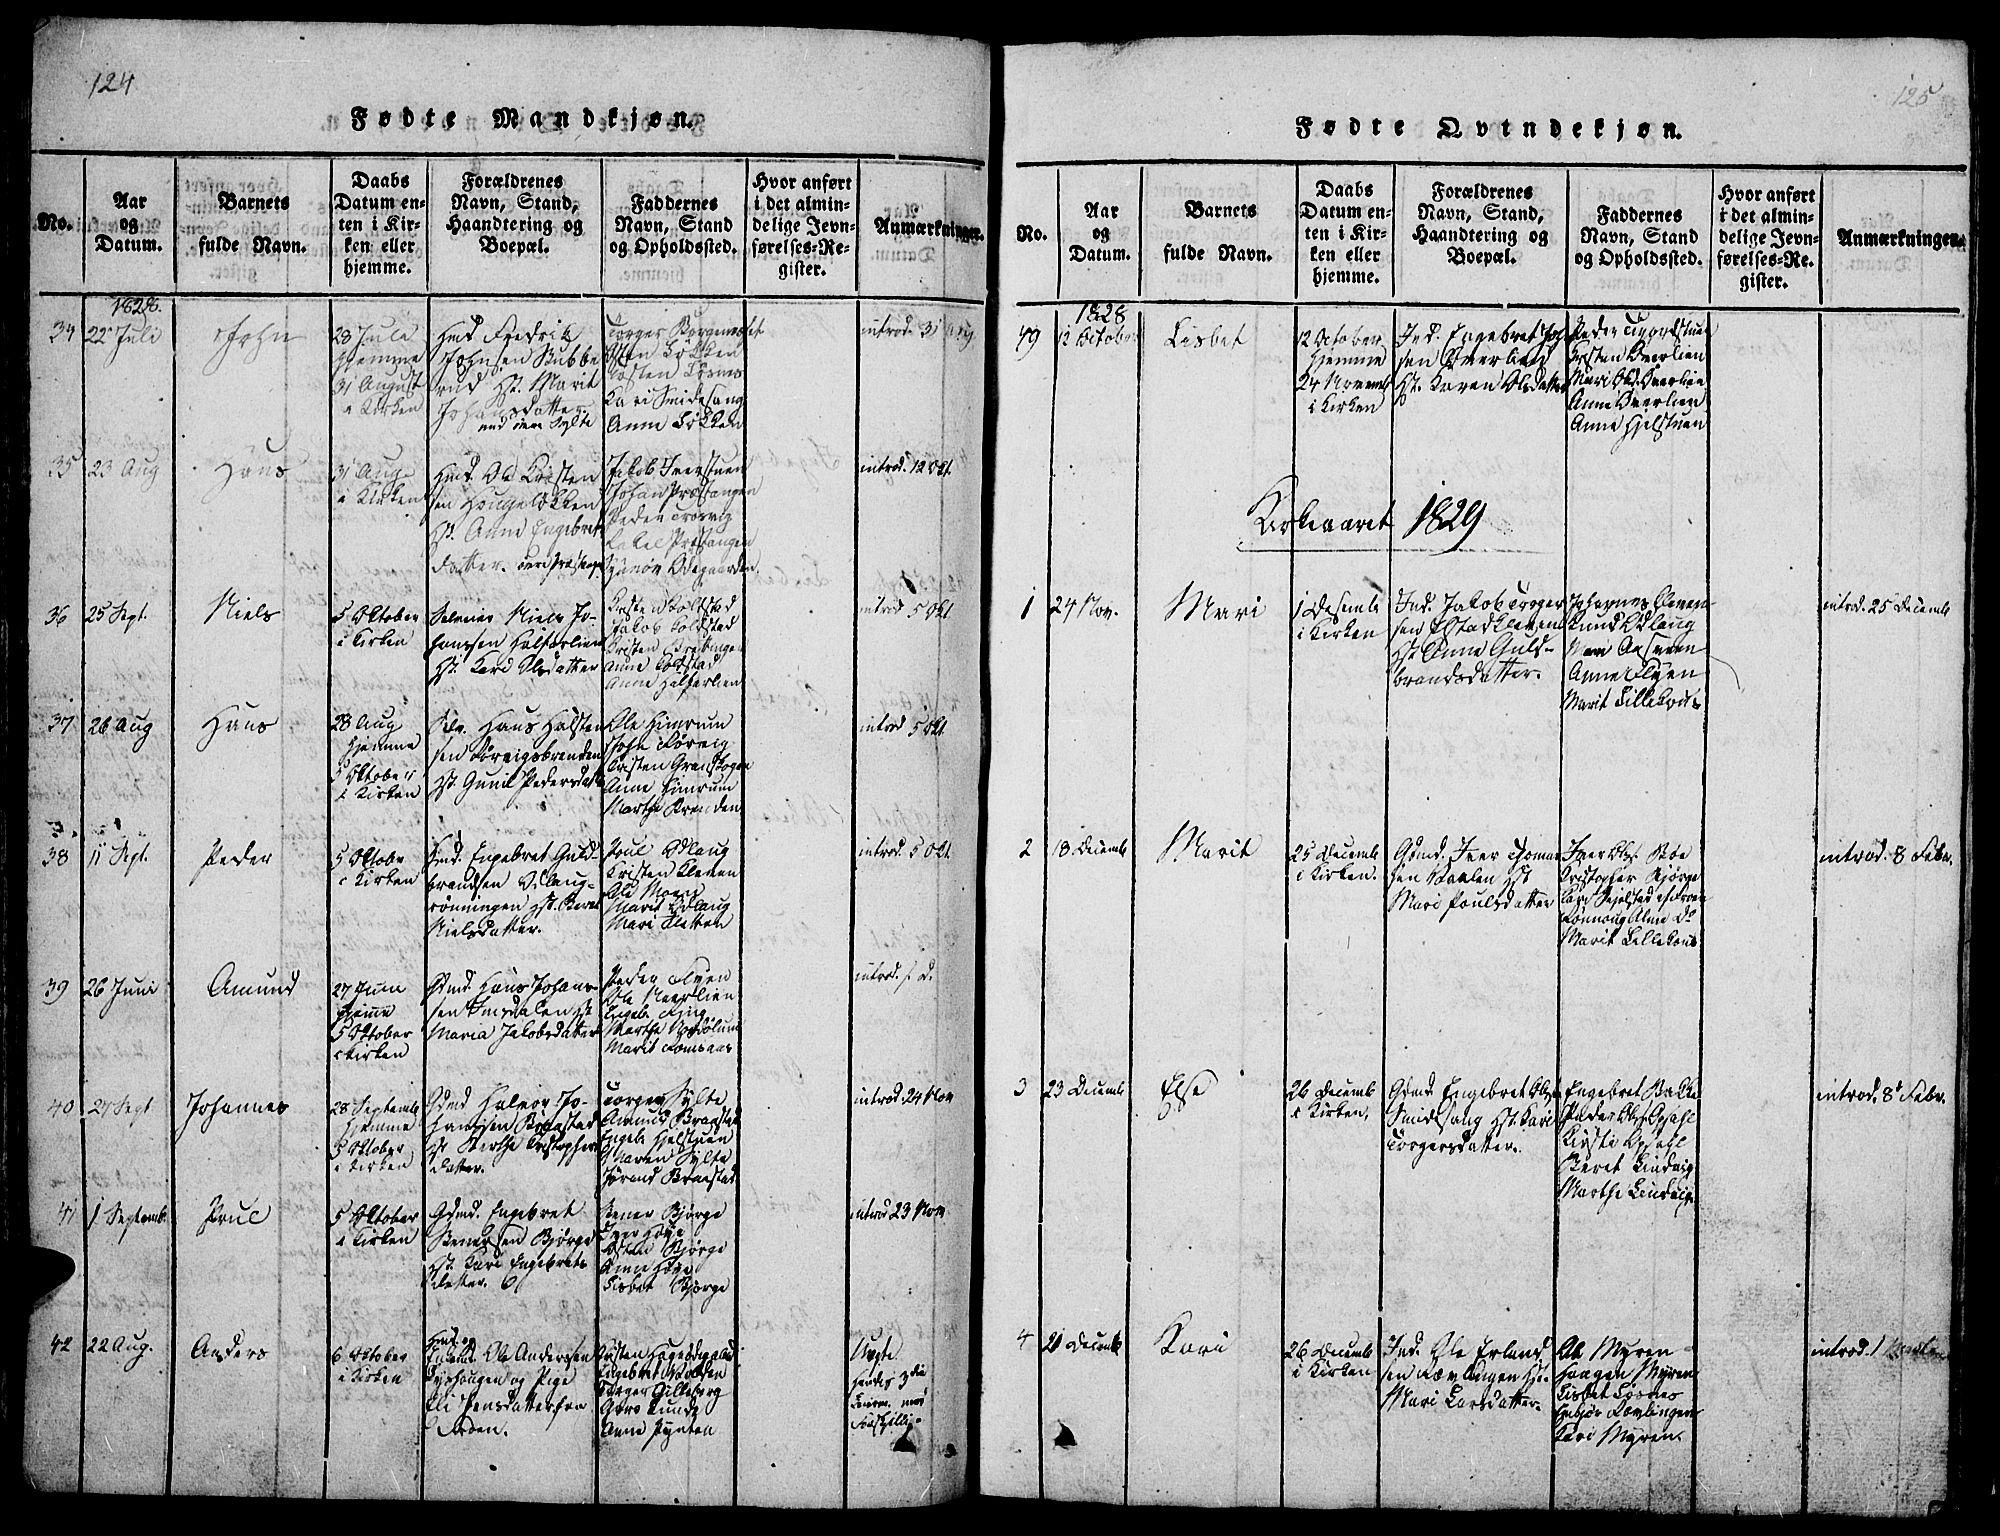 SAH, Ringebu prestekontor, Klokkerbok nr. 1, 1821-1839, s. 124-125